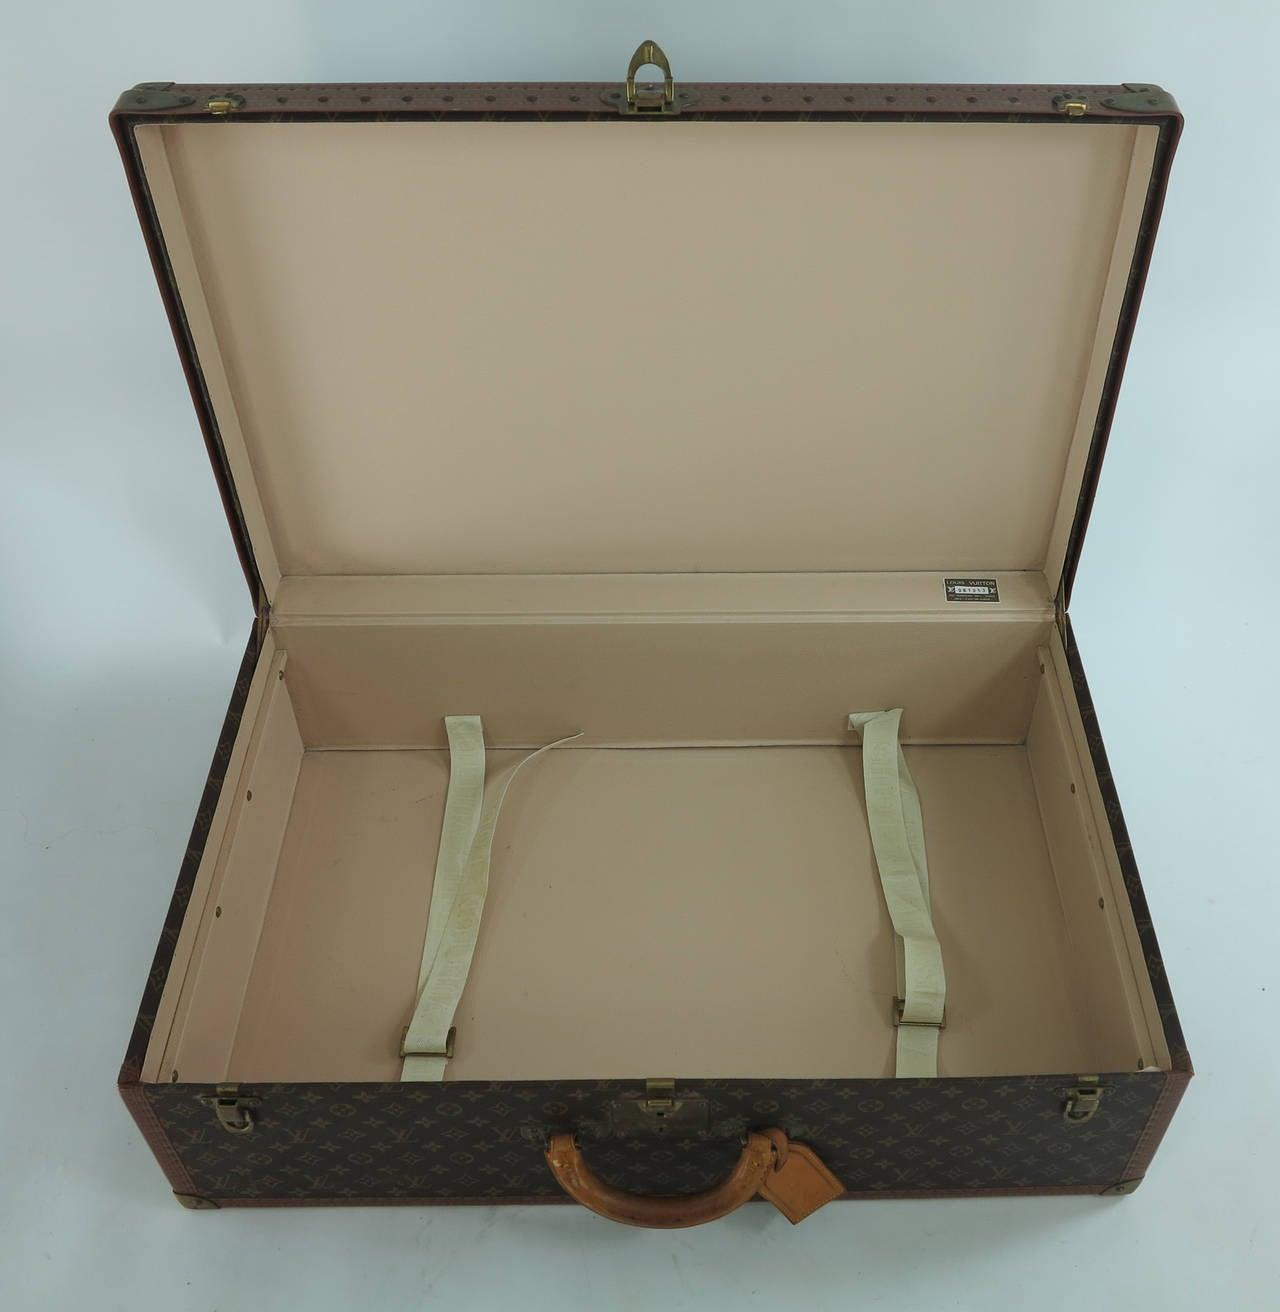 Louis Vuitton Alzar 80 monogram hardside suitcase/trunk 7